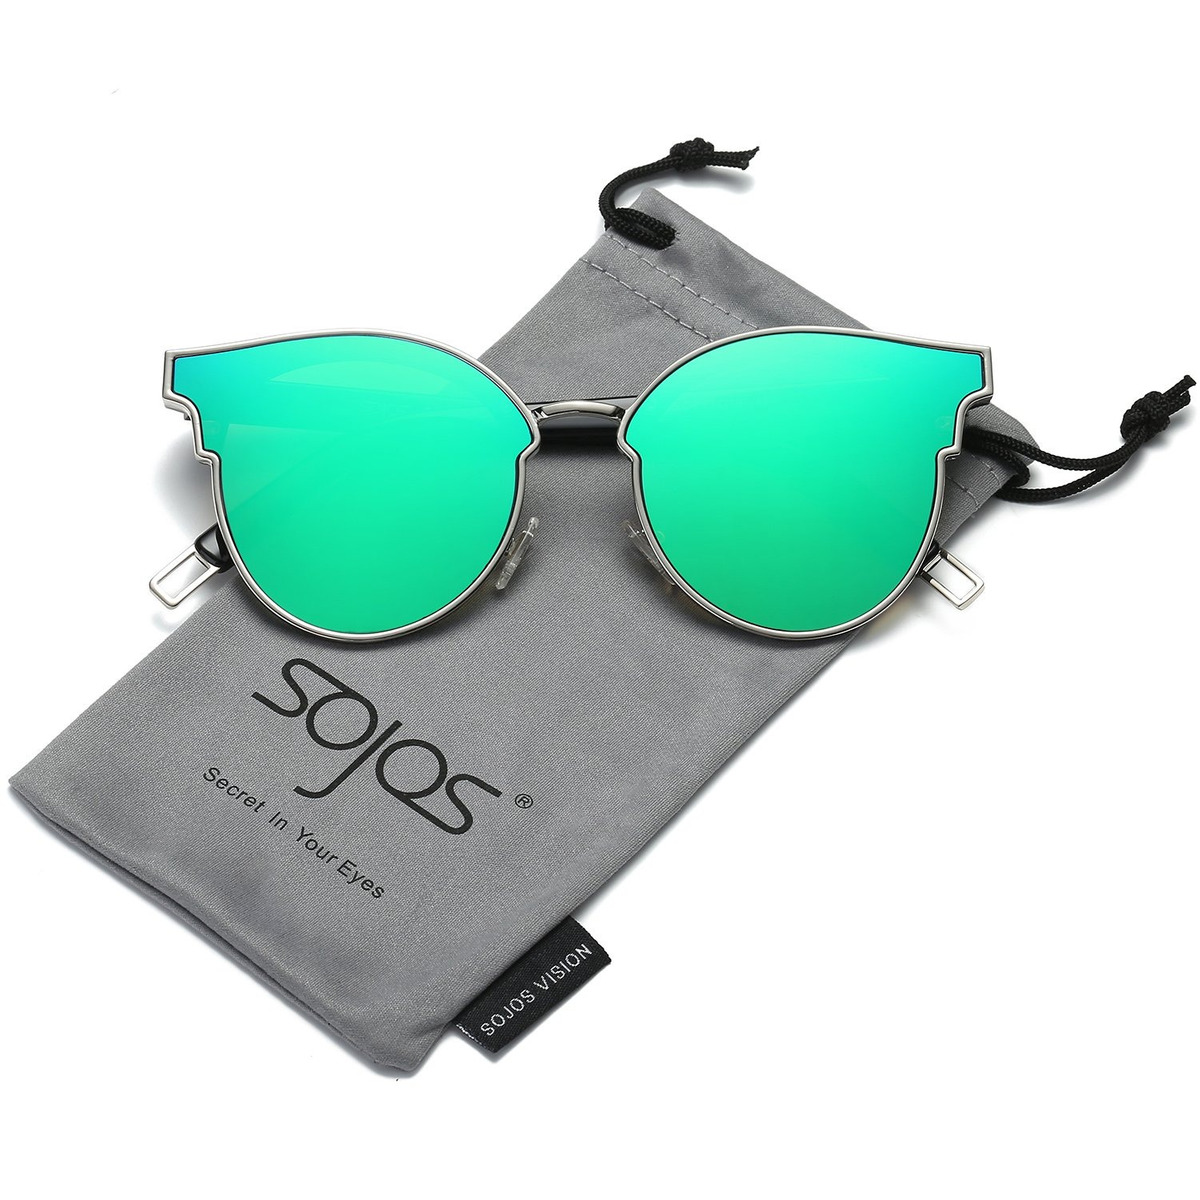 Sol Retro Verde Panto Neón Unisex Gafas Forma Sojos Modernas 34qjAc5RL